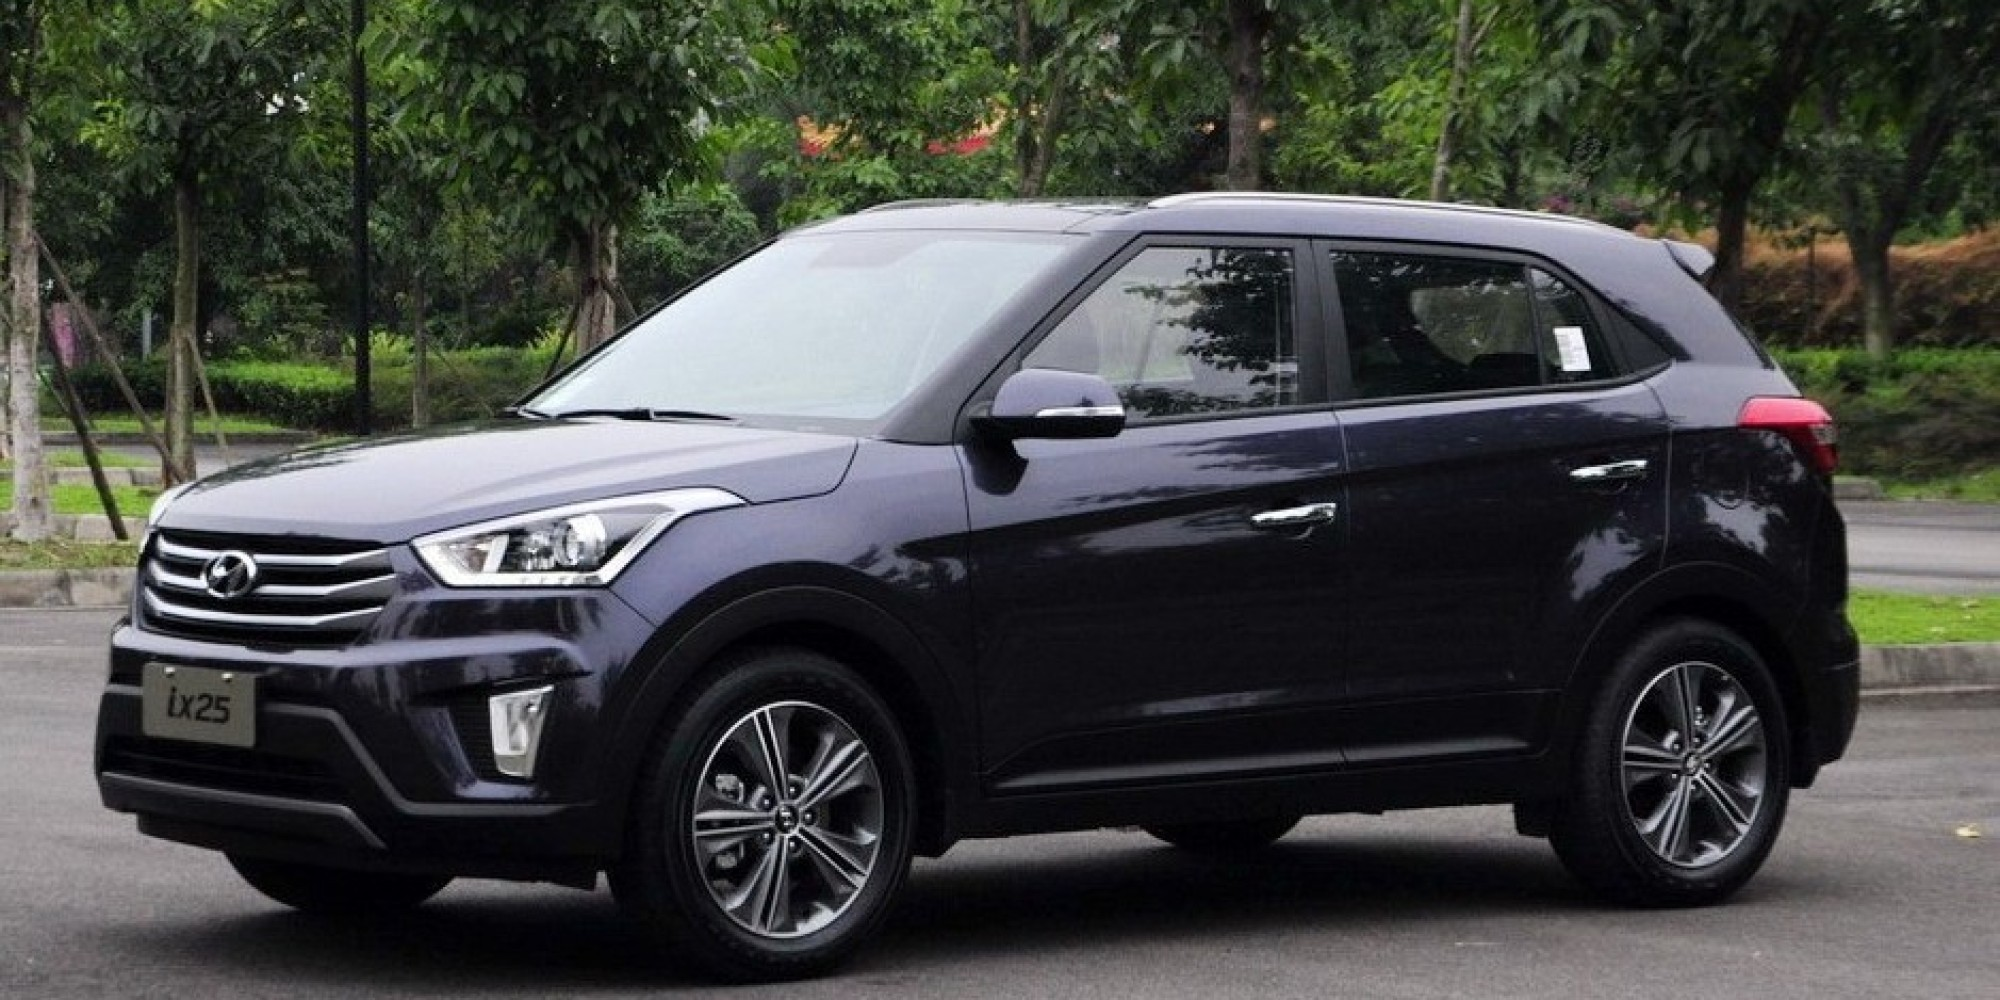 Hyundai Creta Launching On July 21 Targets Festive Sales